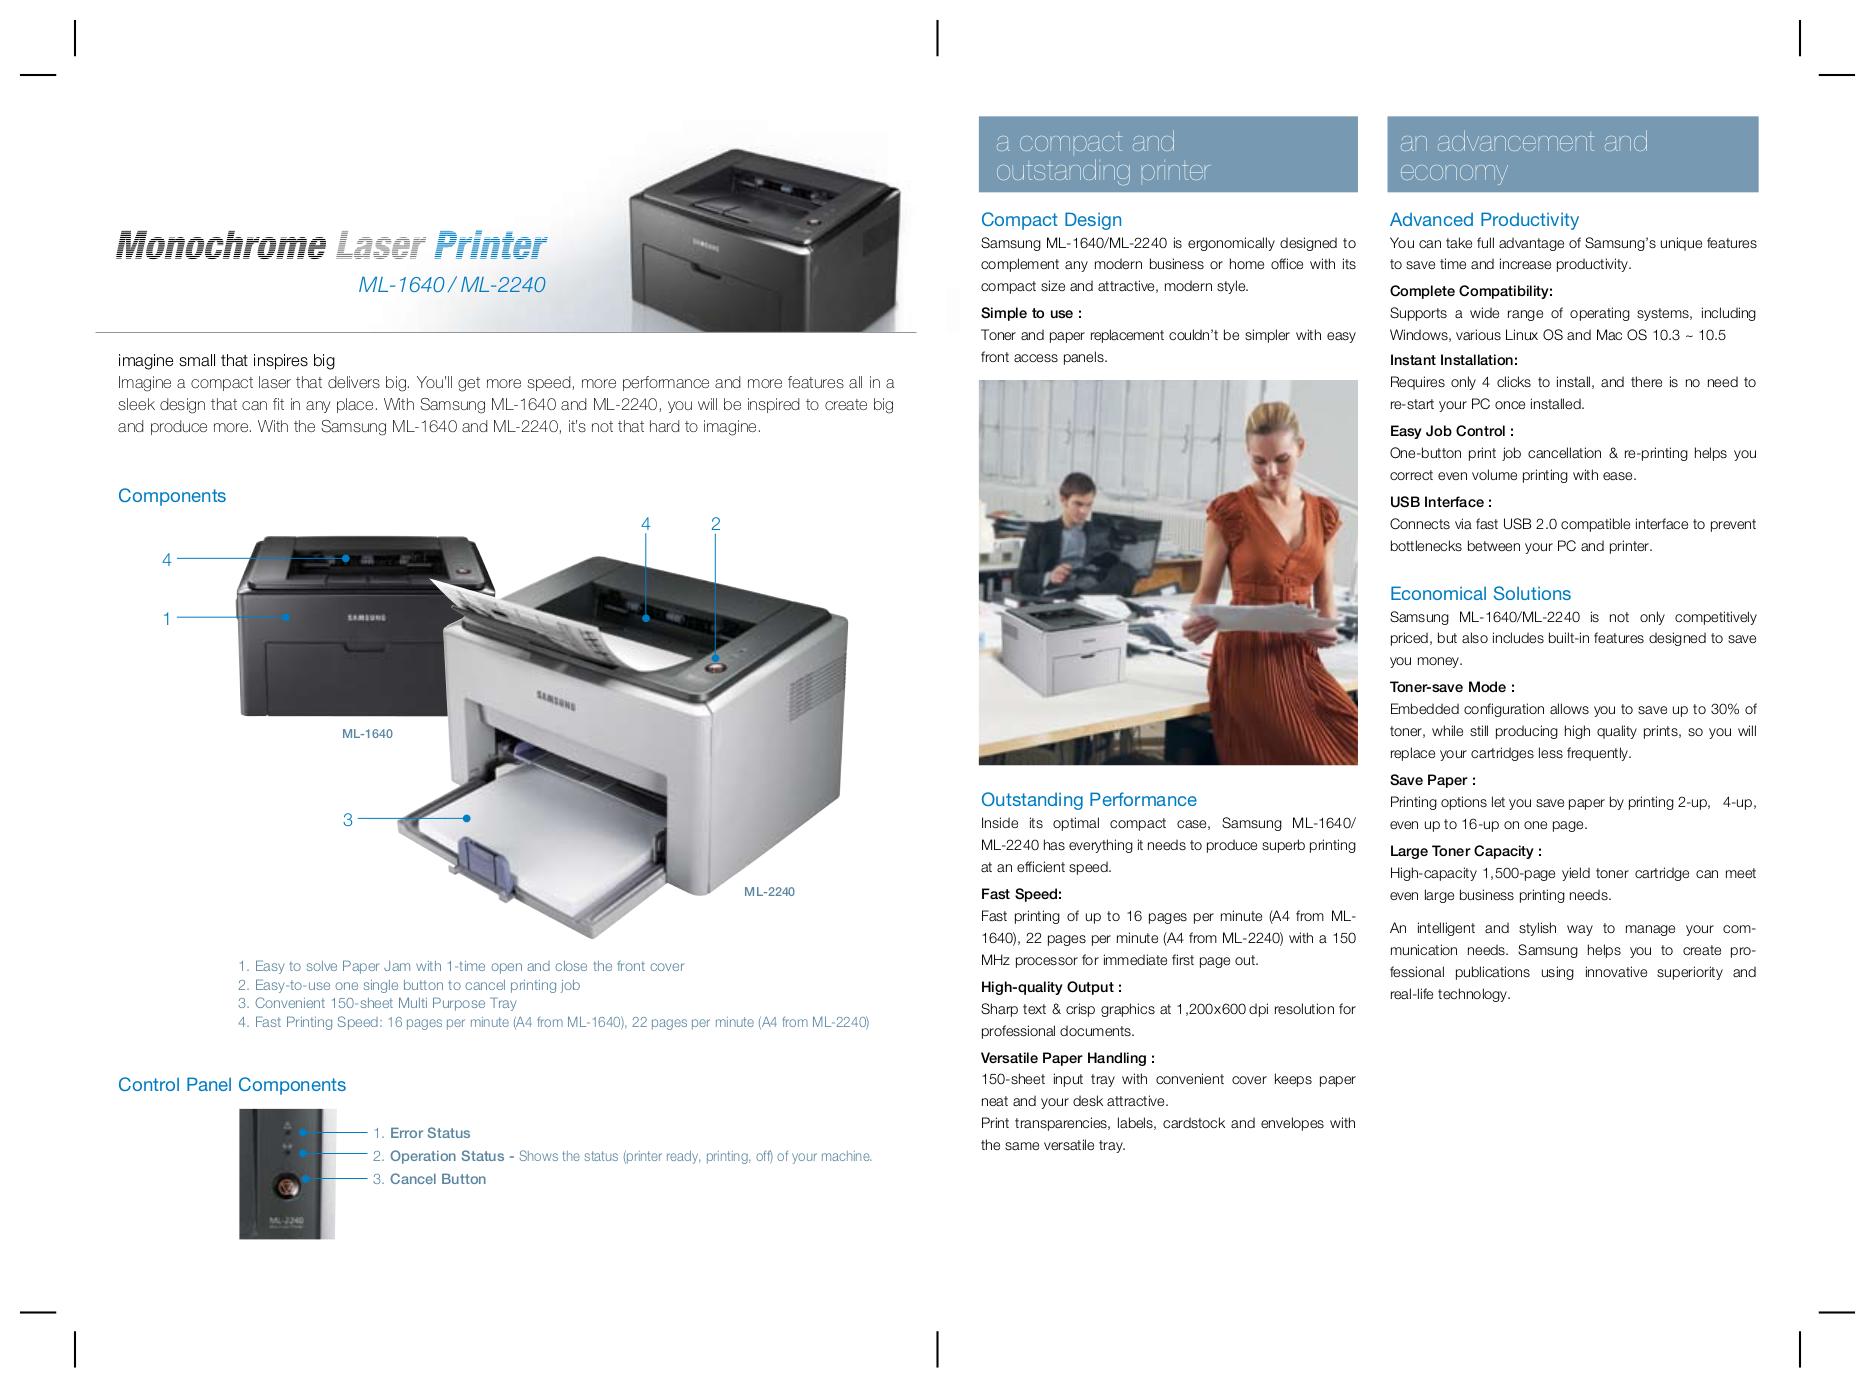 Job Readiness Manuals Ebook Honeywell Smart Vfd Compact The Ultimate Guide To Posting Array Samsung Ml 1640 Manual Pdf Rh Nitrorocks